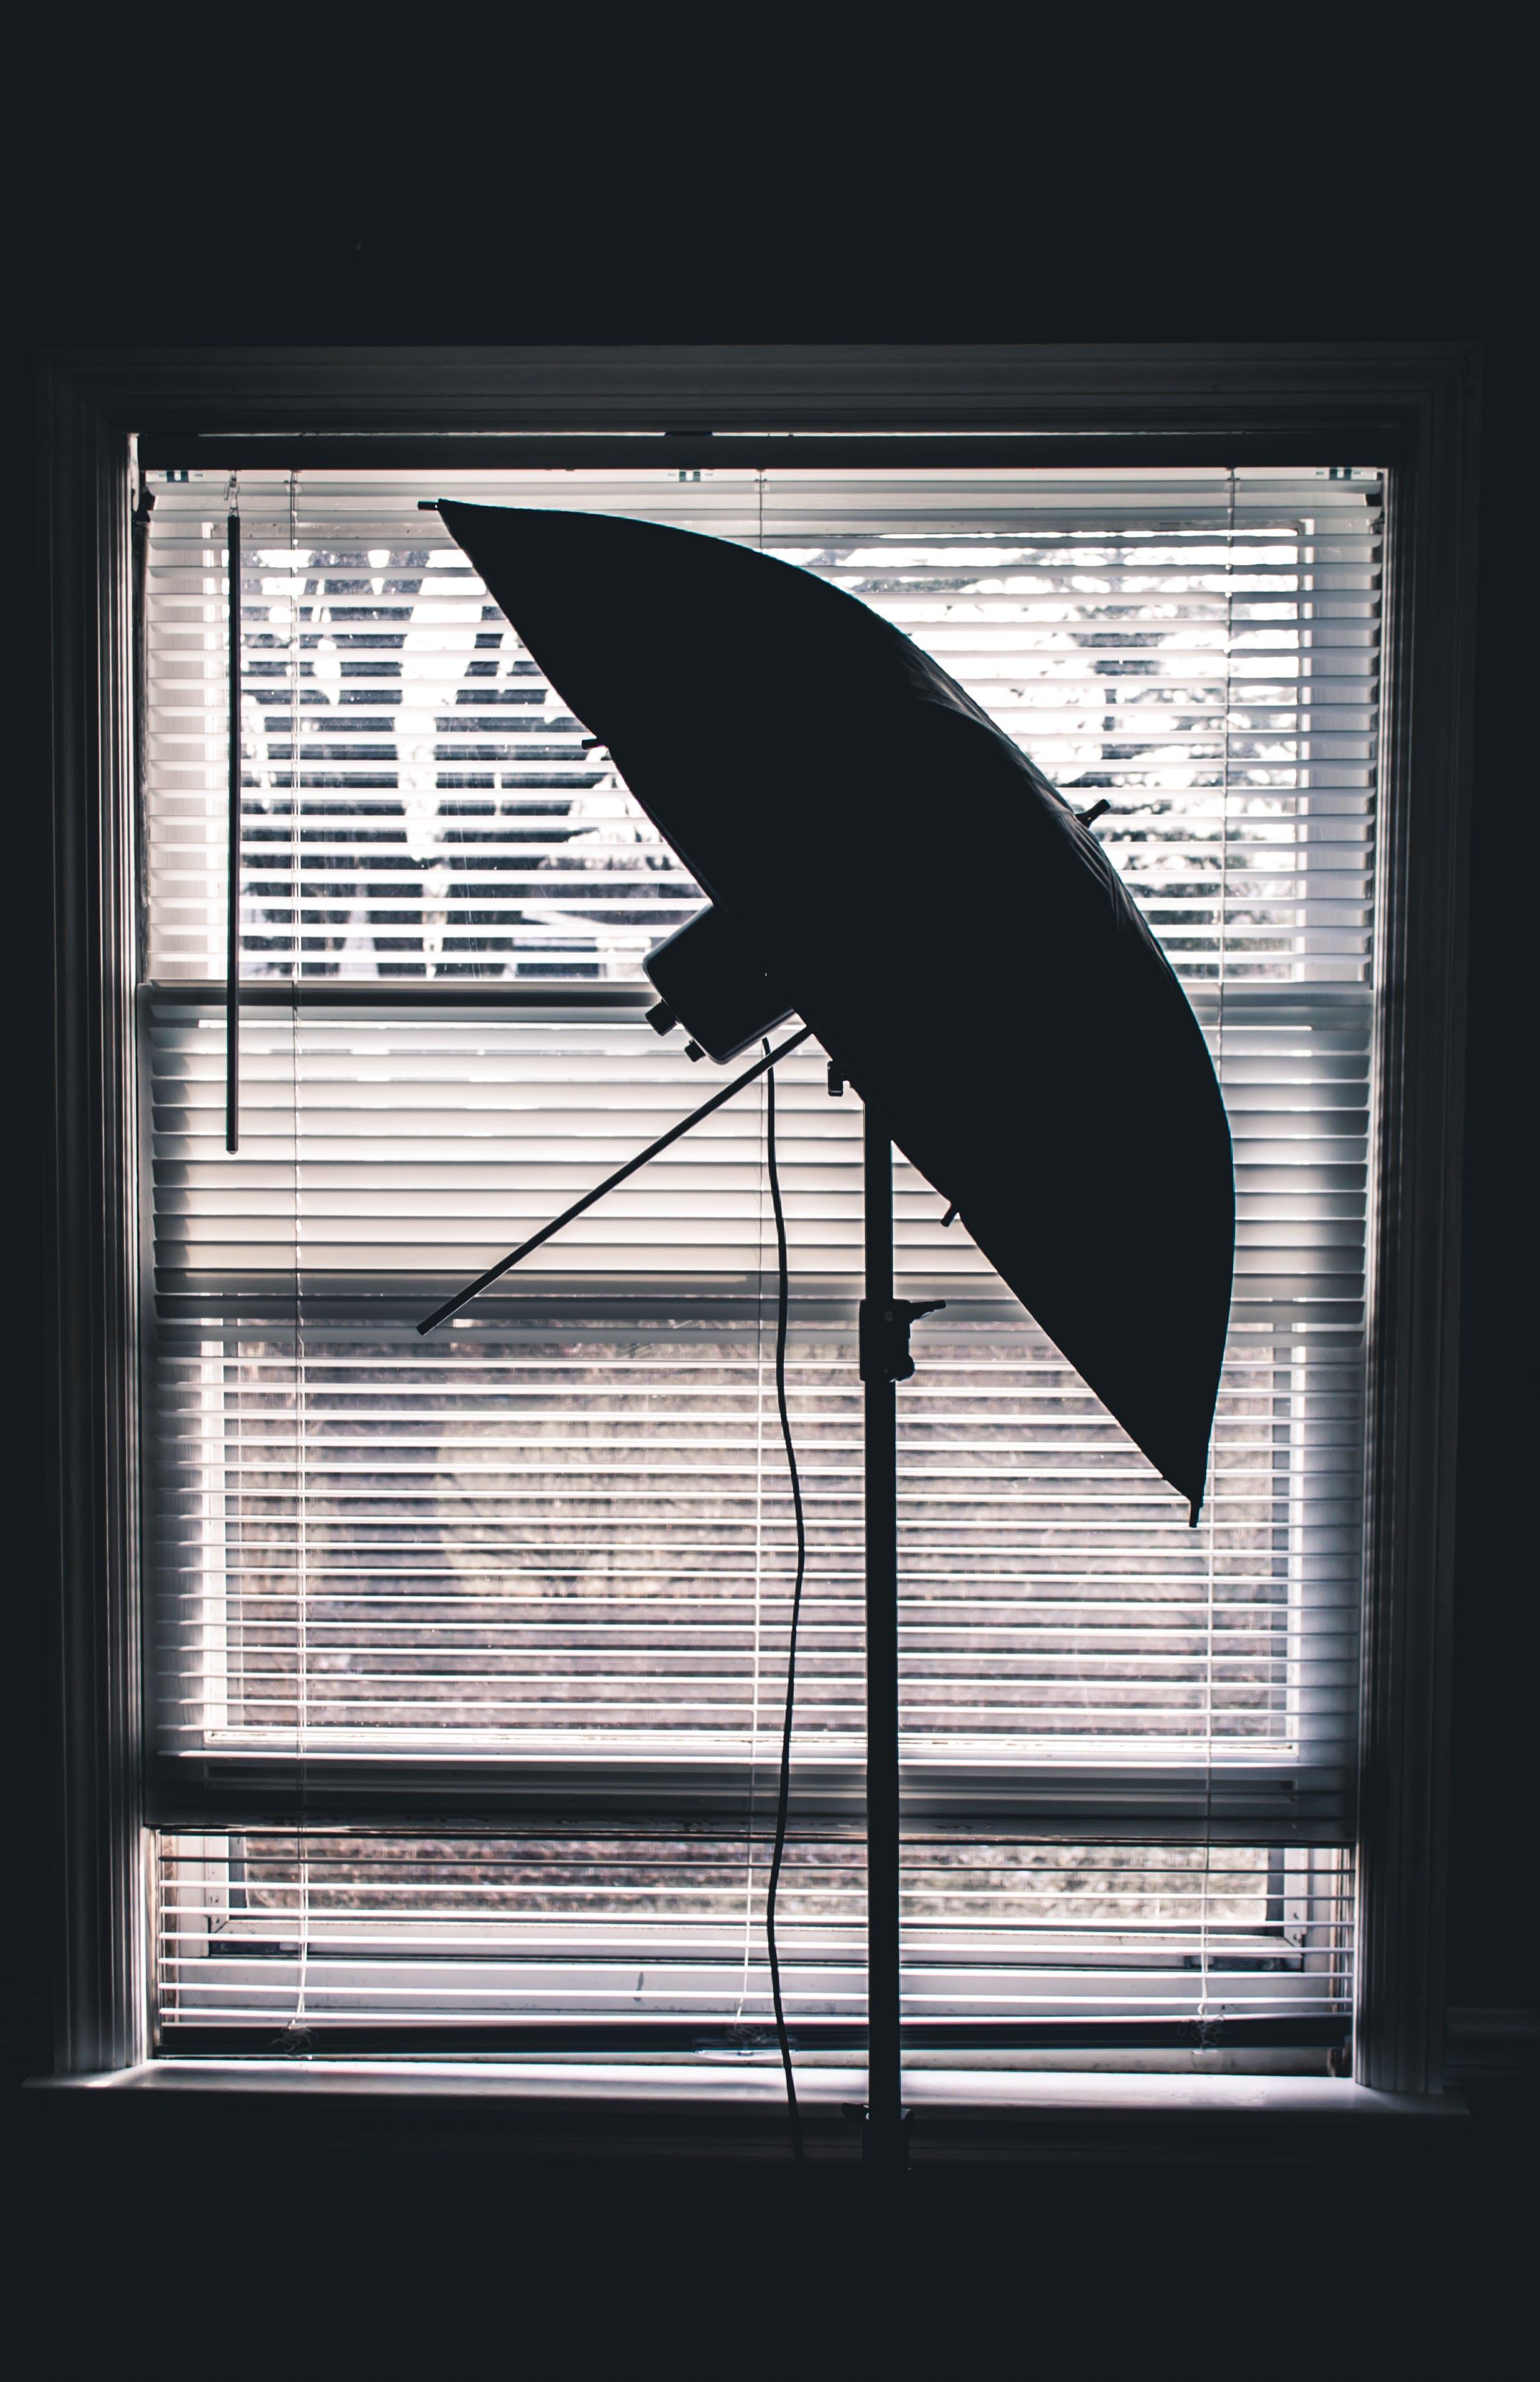 Silhouette Photo of Studio Umbrella Near White Window Blinds Inside Room